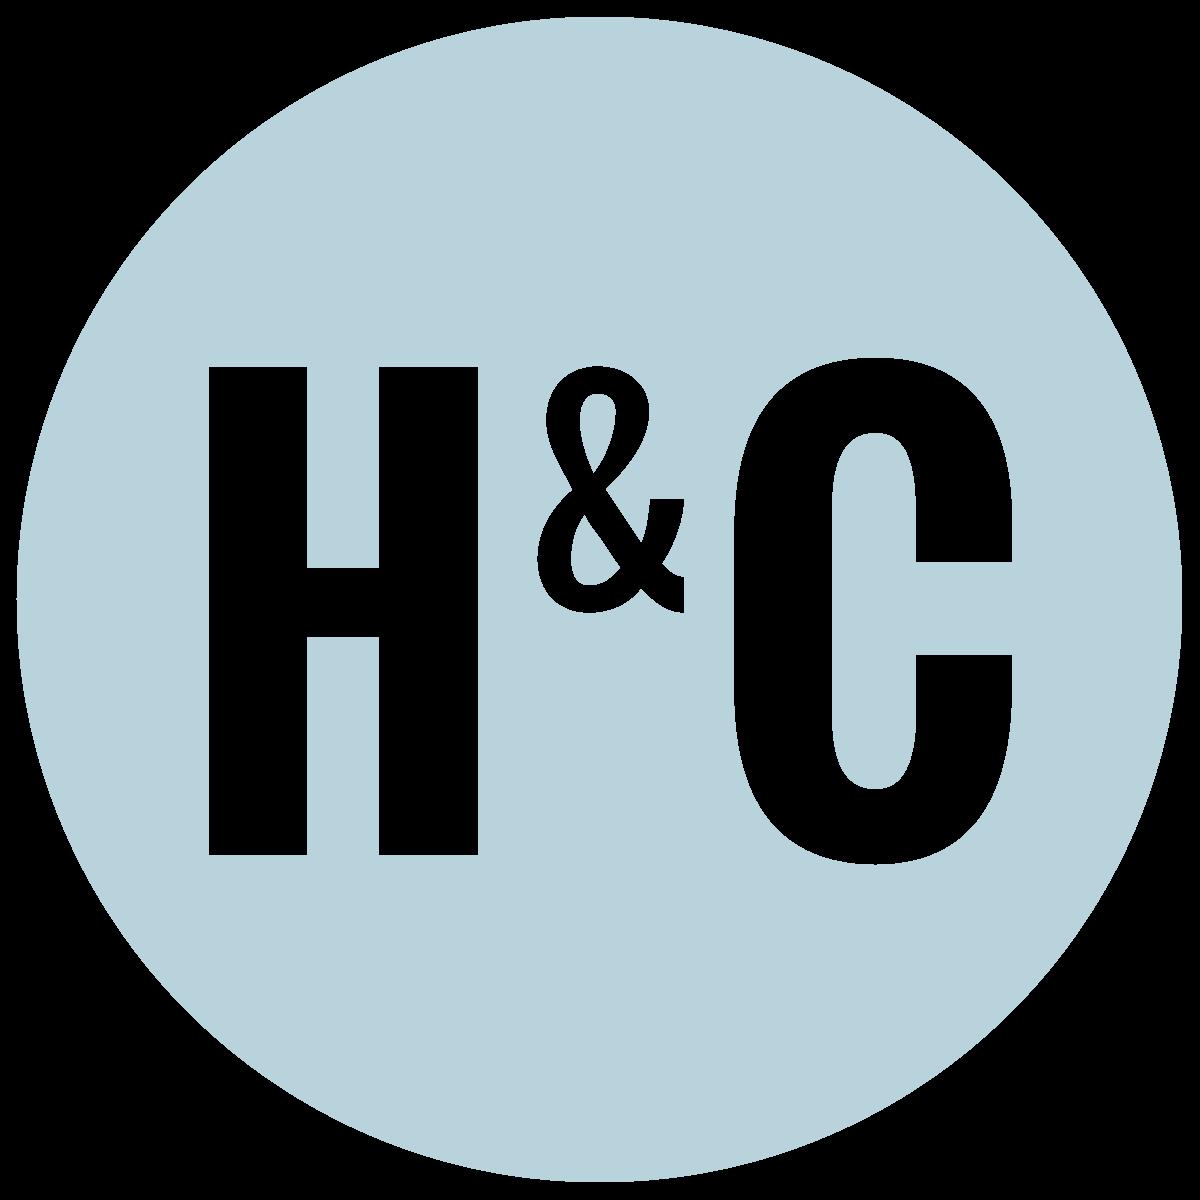 H&C Inc. Digital Marketing Logo